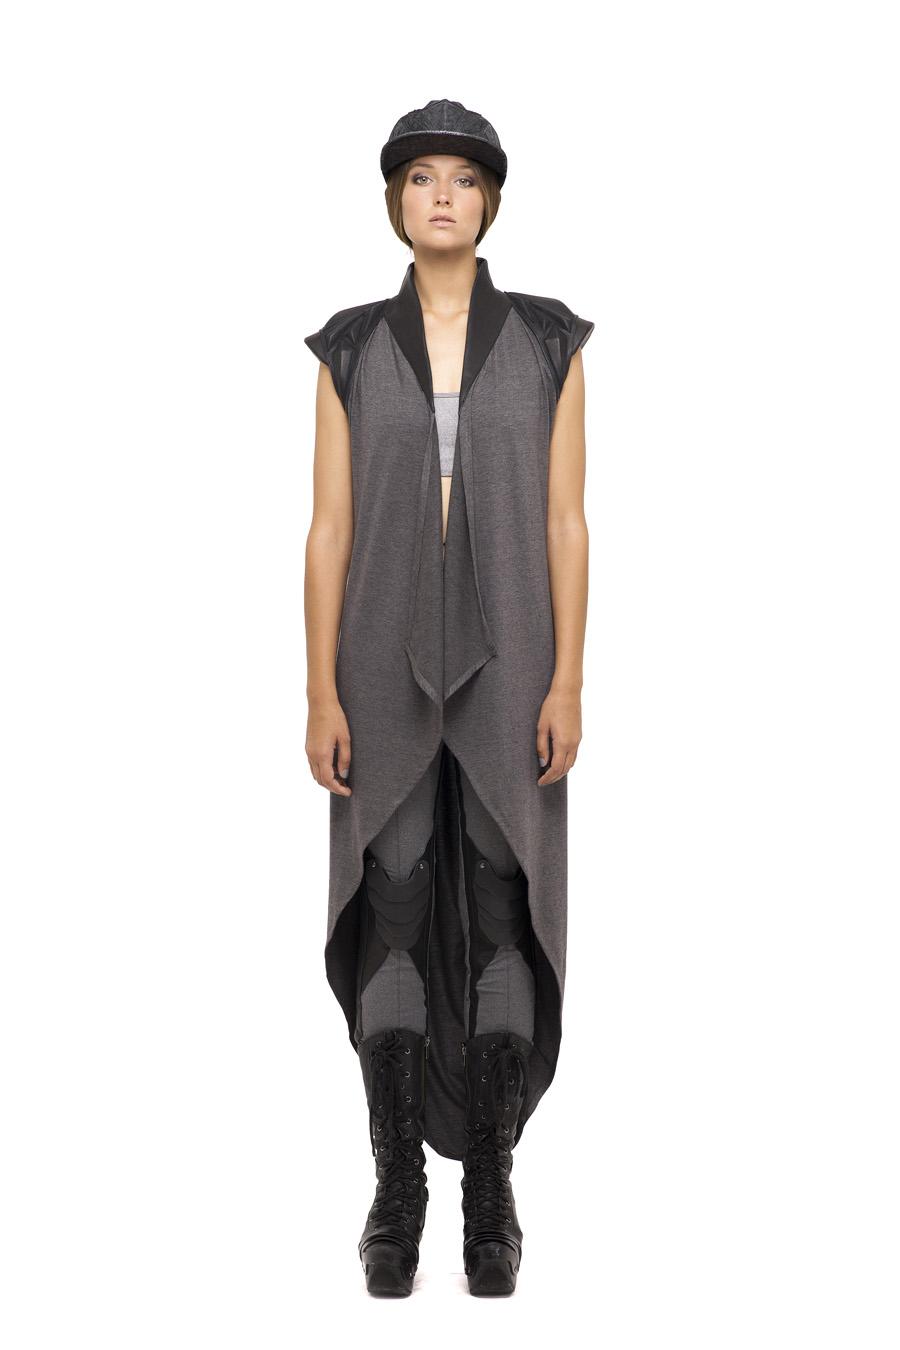 Var Shoulder Dress, Plated Knee Long Leggings